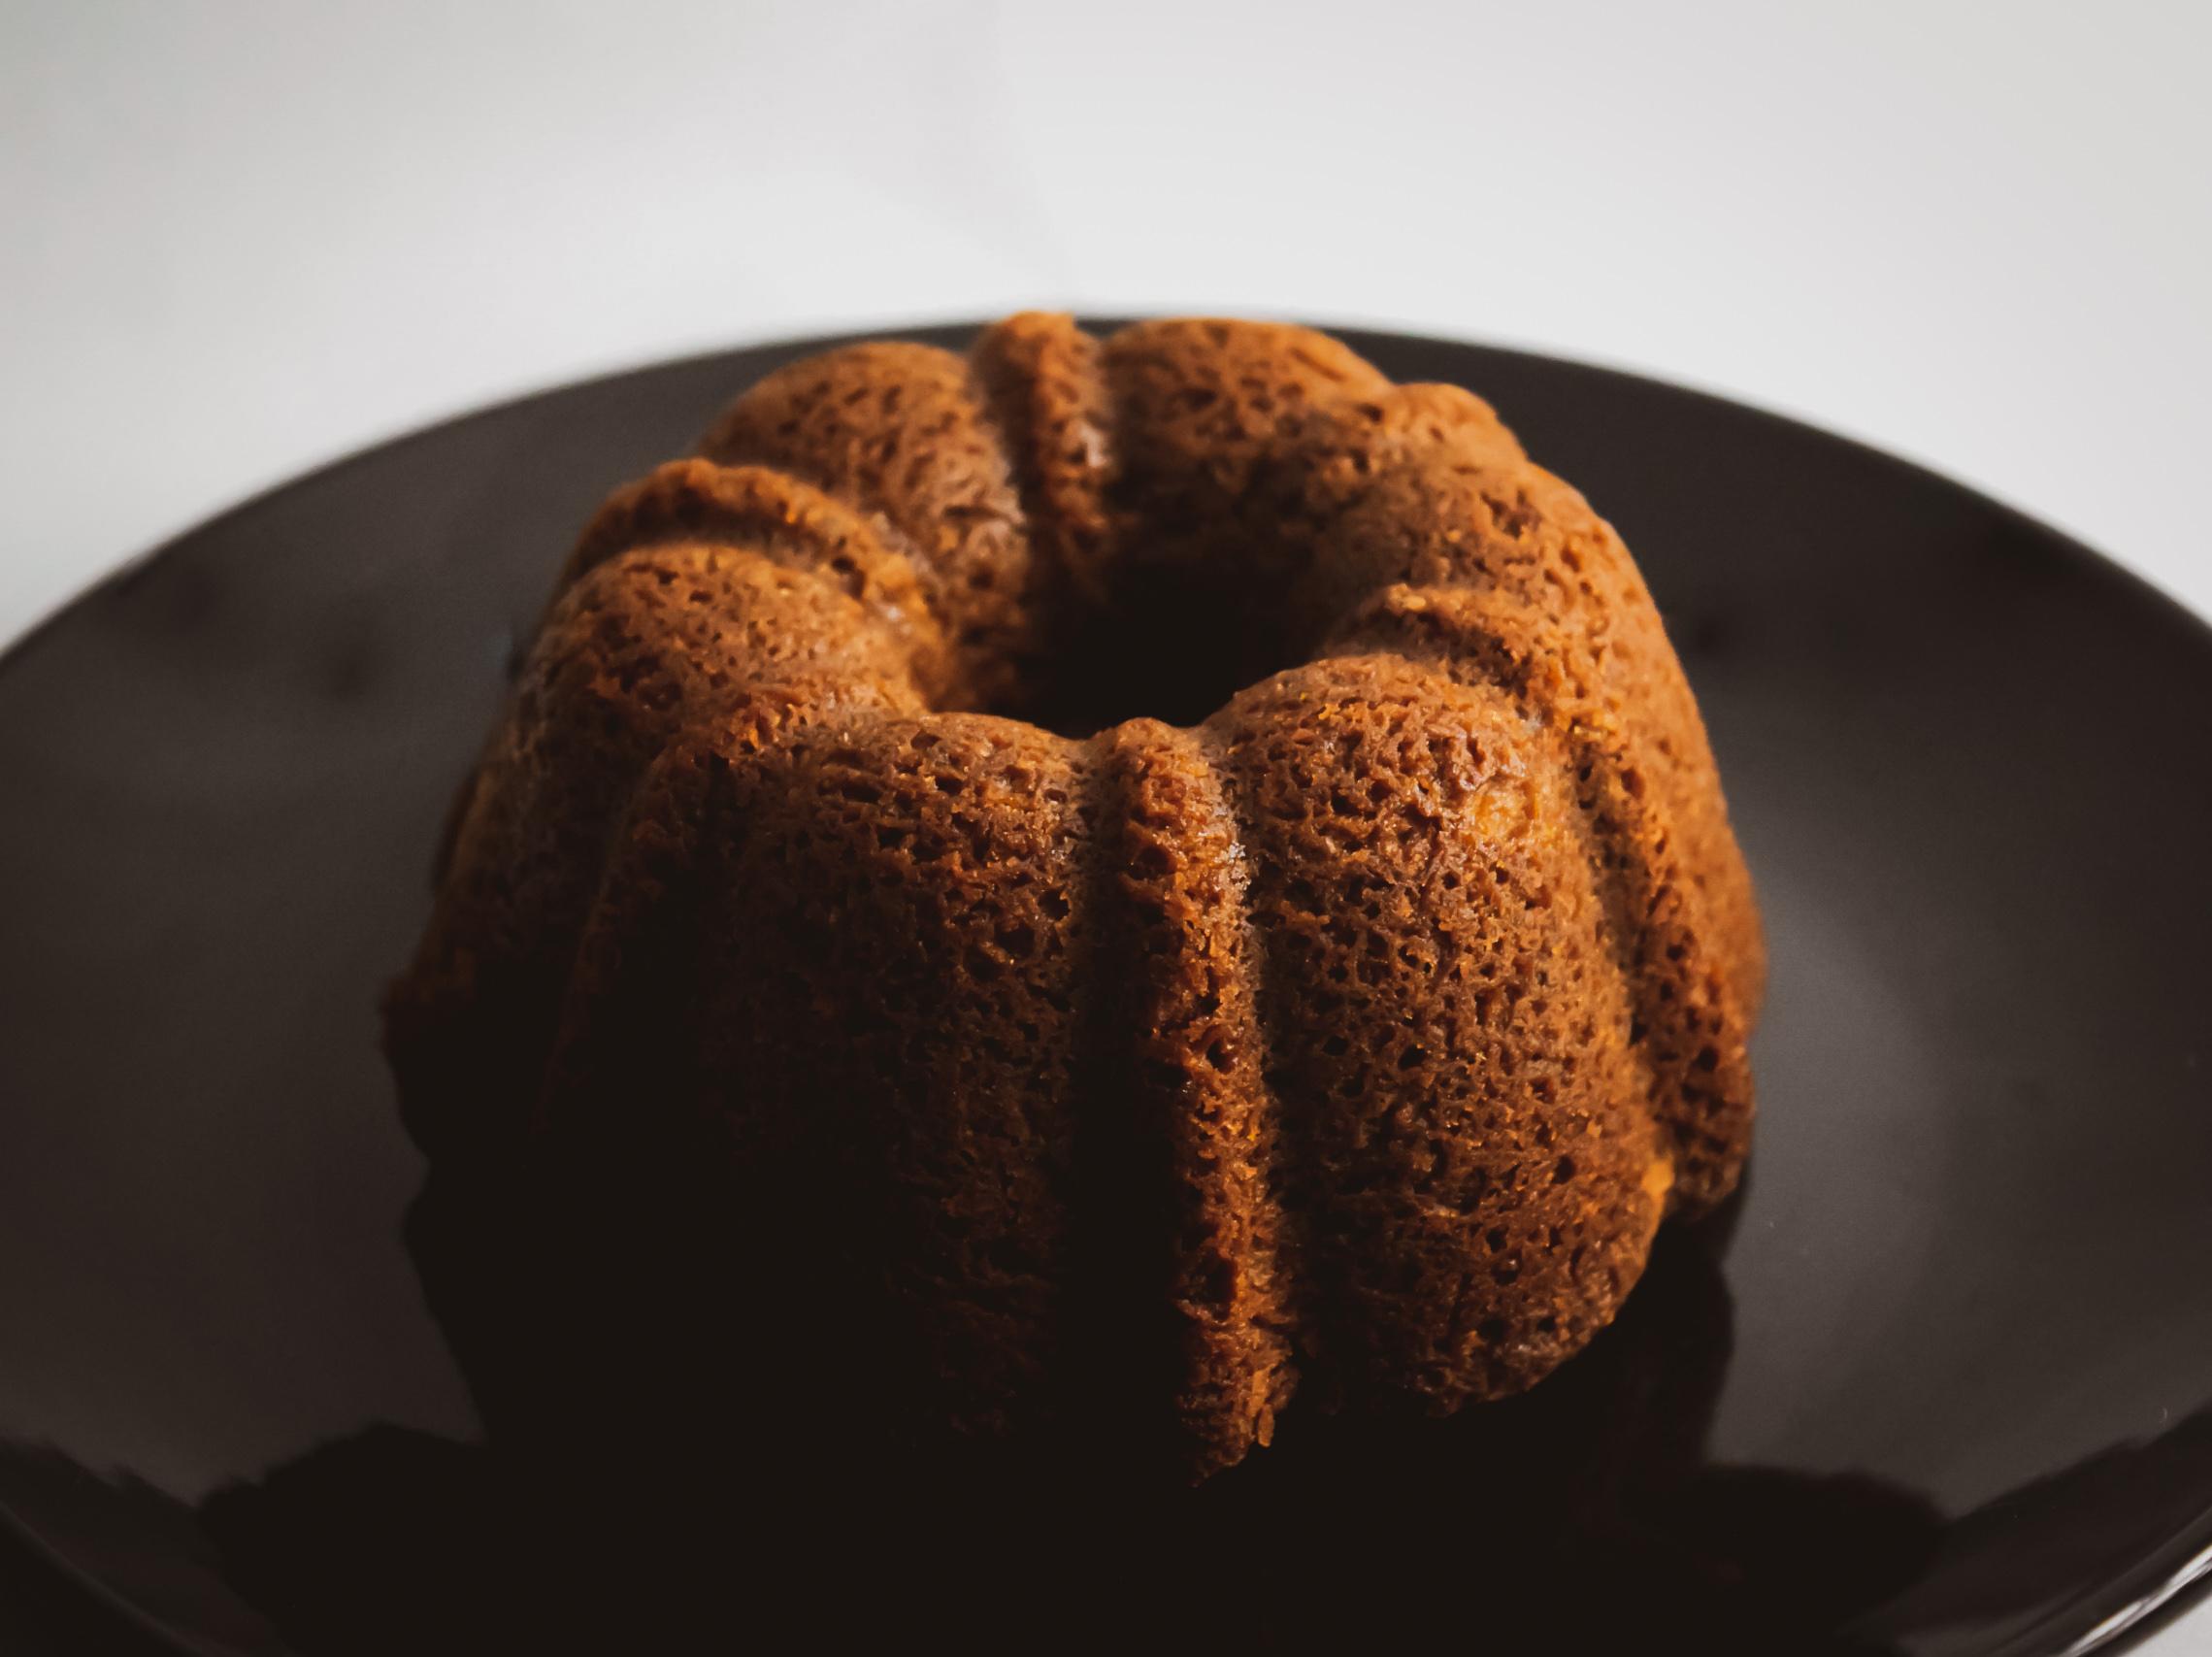 Christopher's Bakery | Dessert | Baked Good | Cake | Mini-Bundt | Cocoa Pound | Chocolate